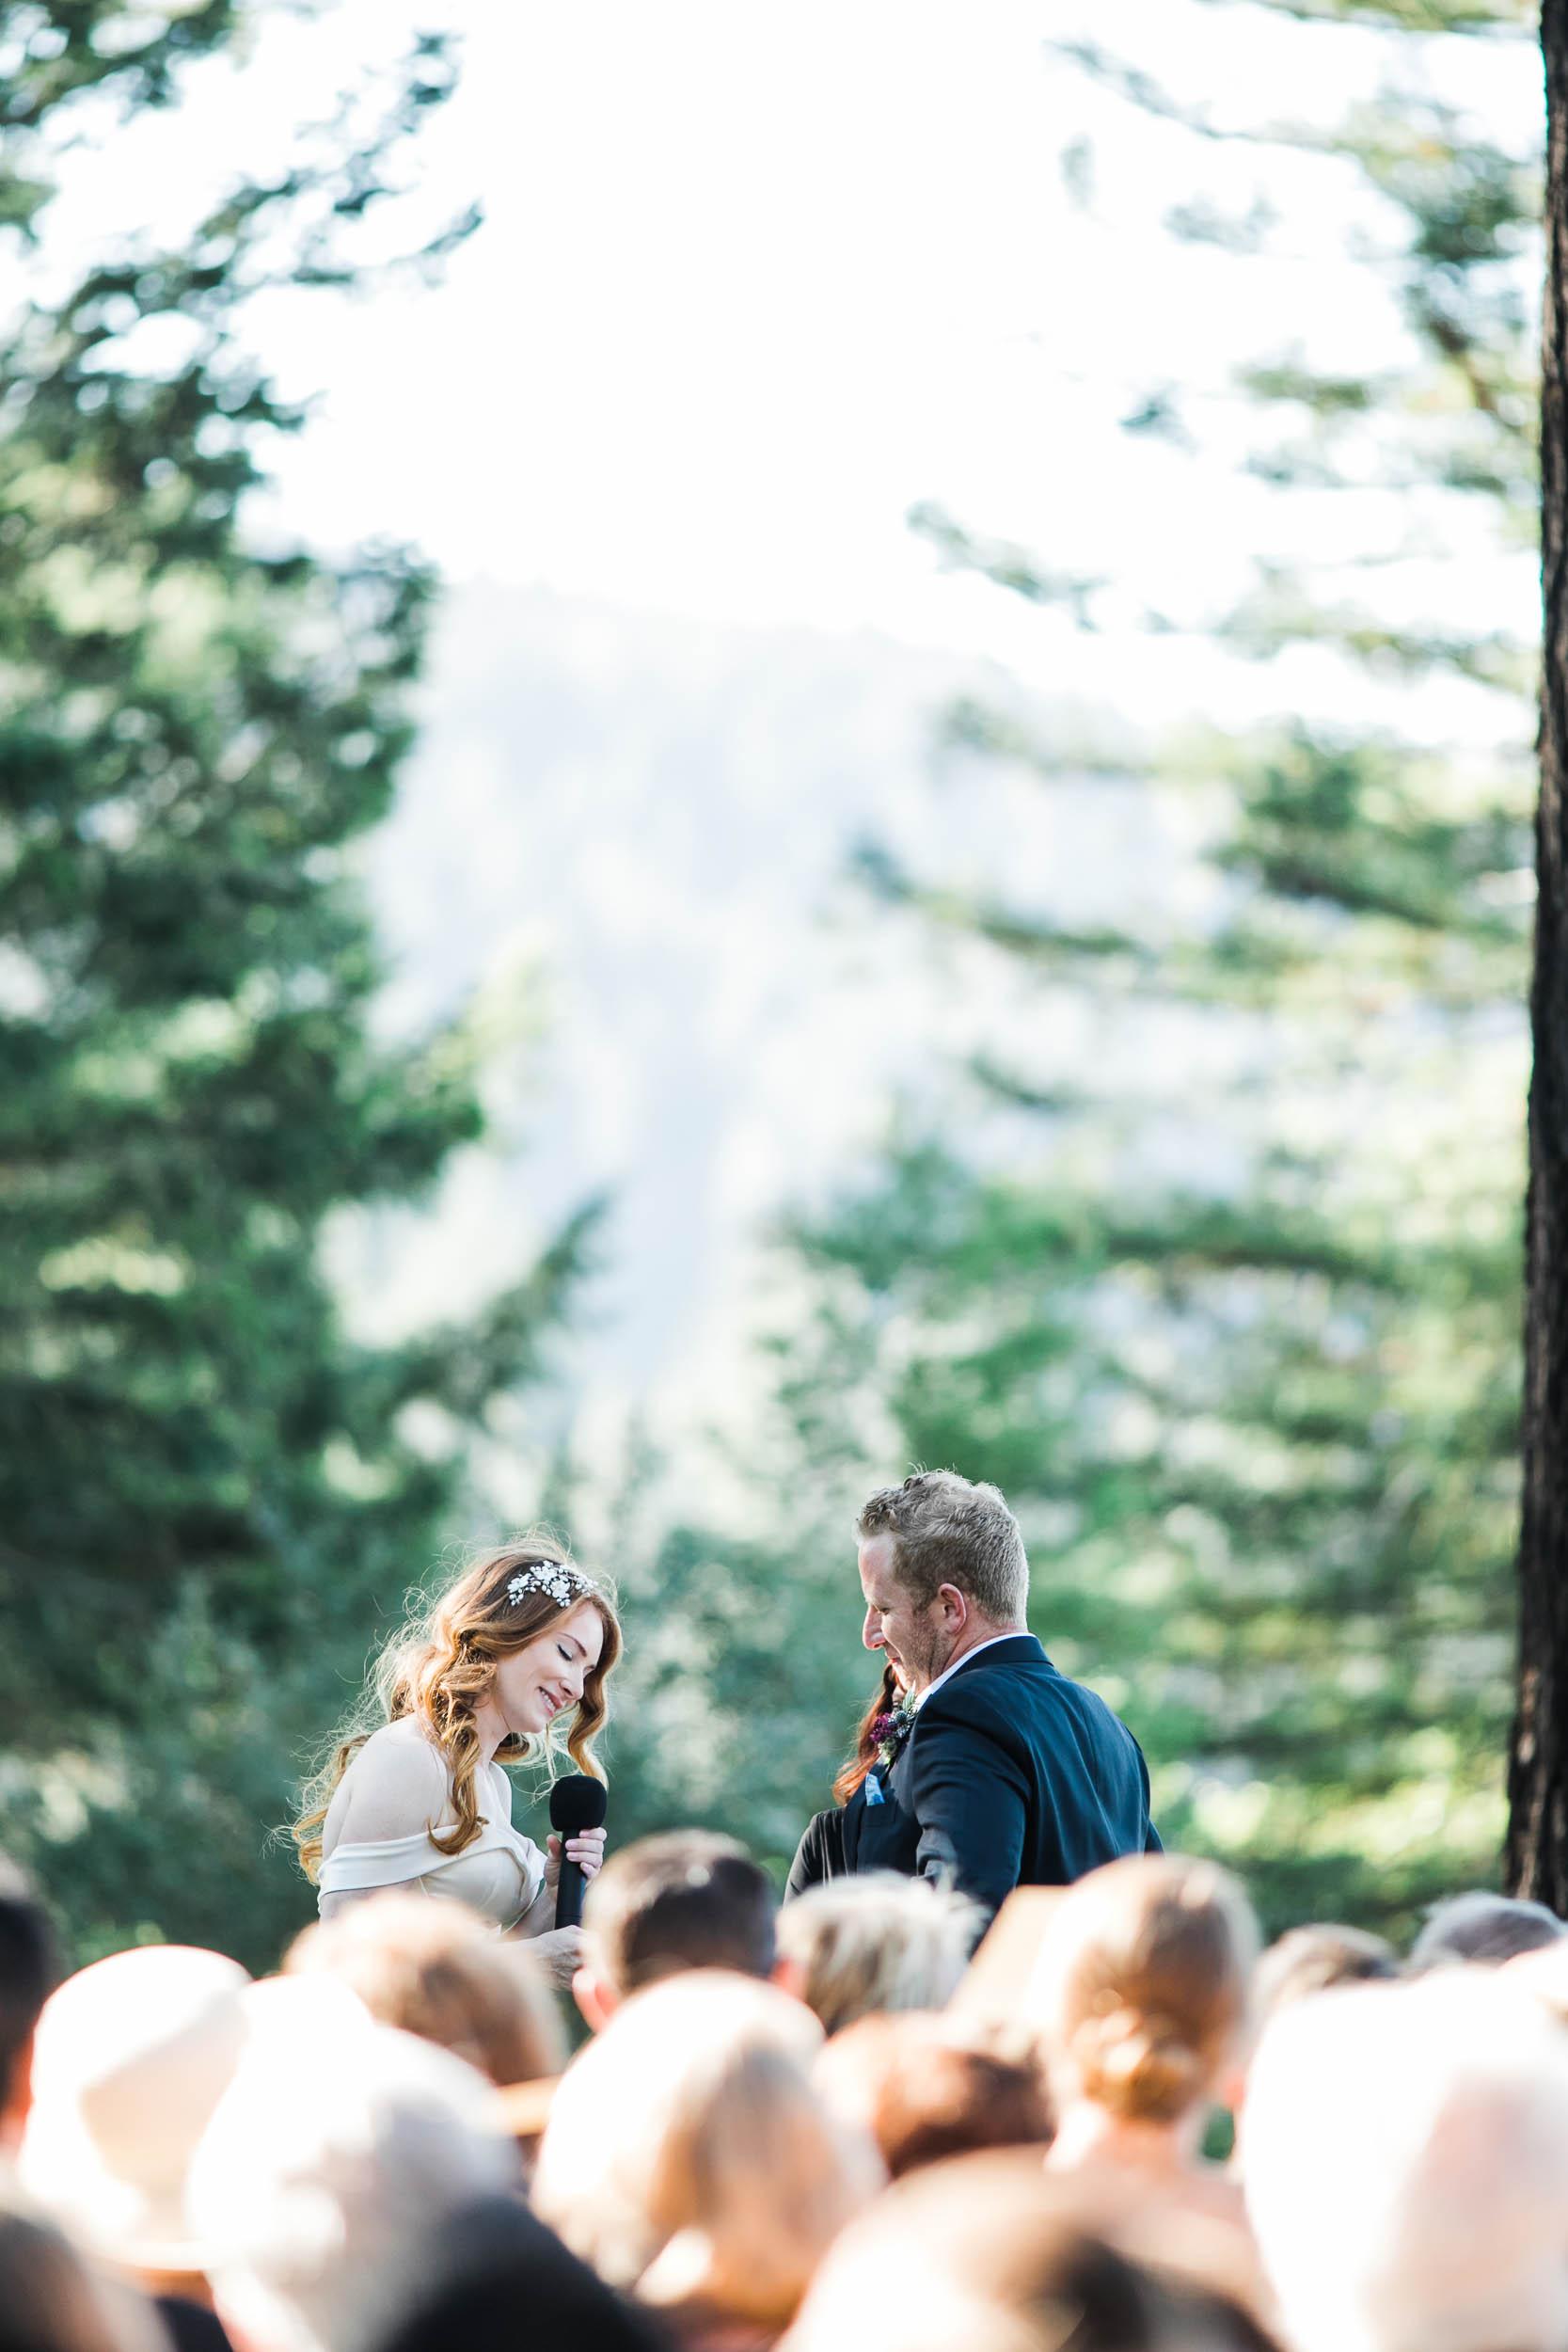 10717_A+C_Wild Iris Philo Wedding_Buena Lane Photography_0984ER.jpg